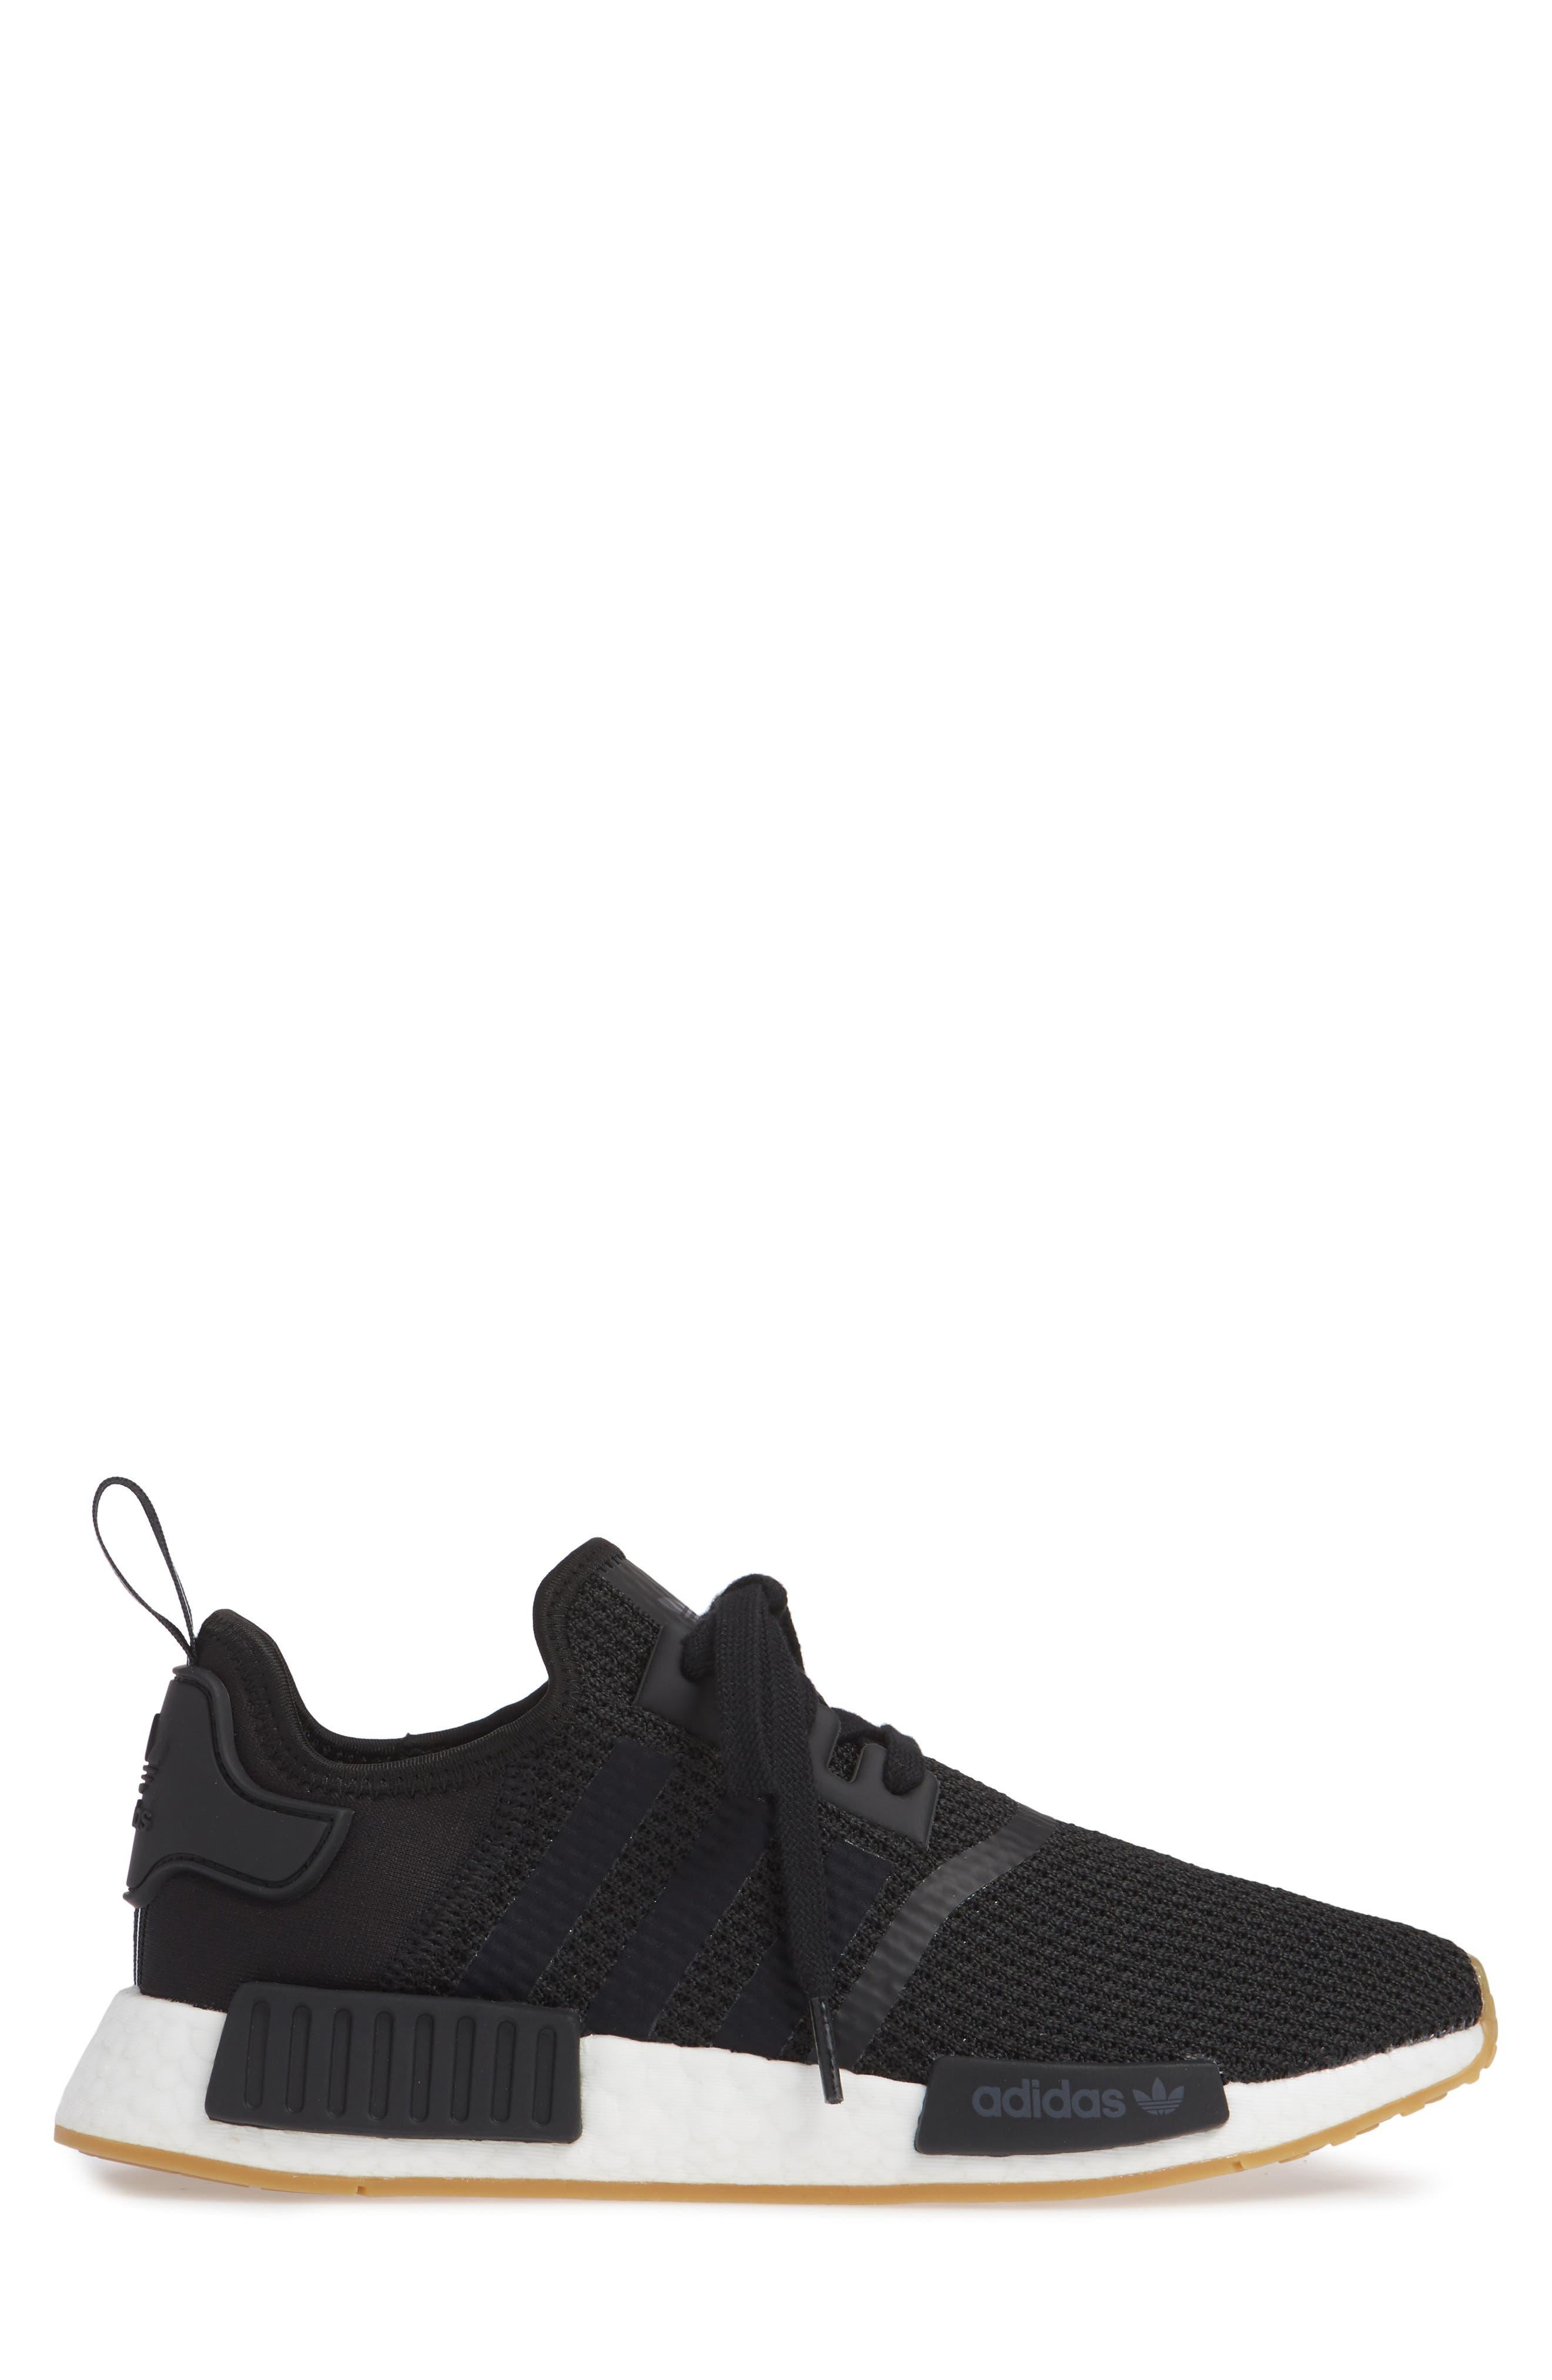 Originals NMD R1 Sneaker,                             Alternate thumbnail 3, color,                             BLACK/ BLACK/ GUM